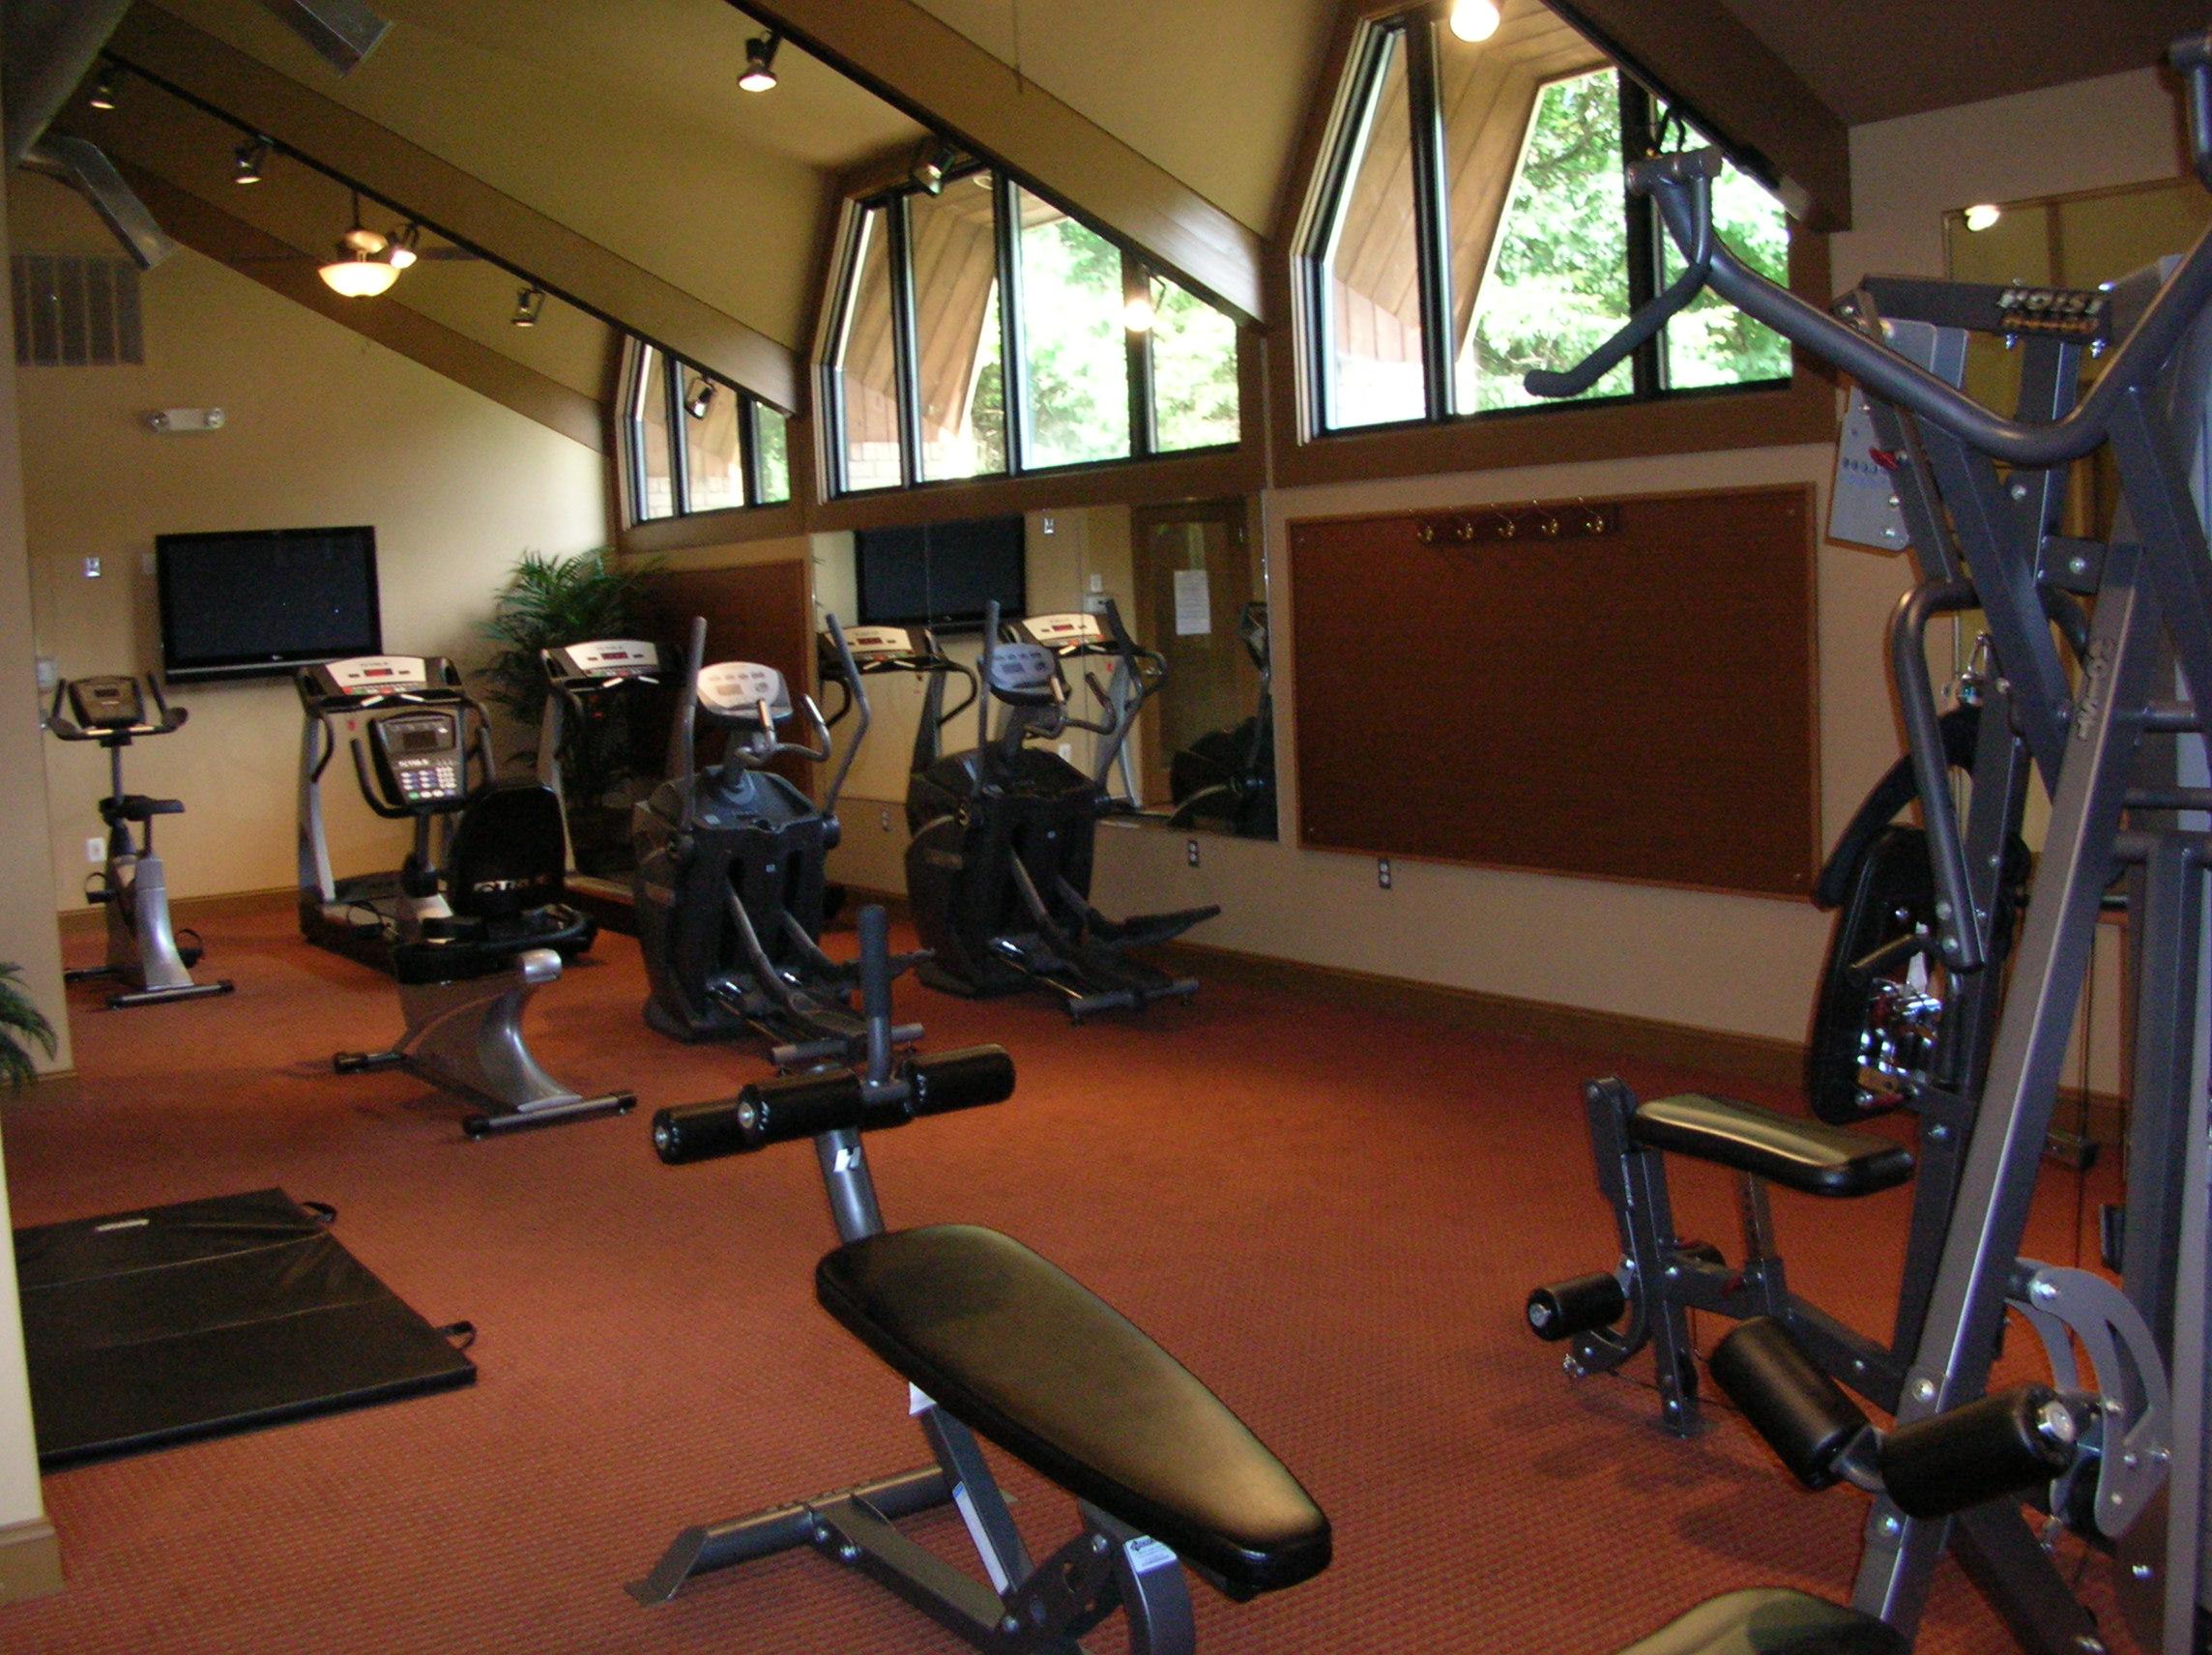 16-FurnishedApartmentNorthBrunswick-11A_FitnessRoom